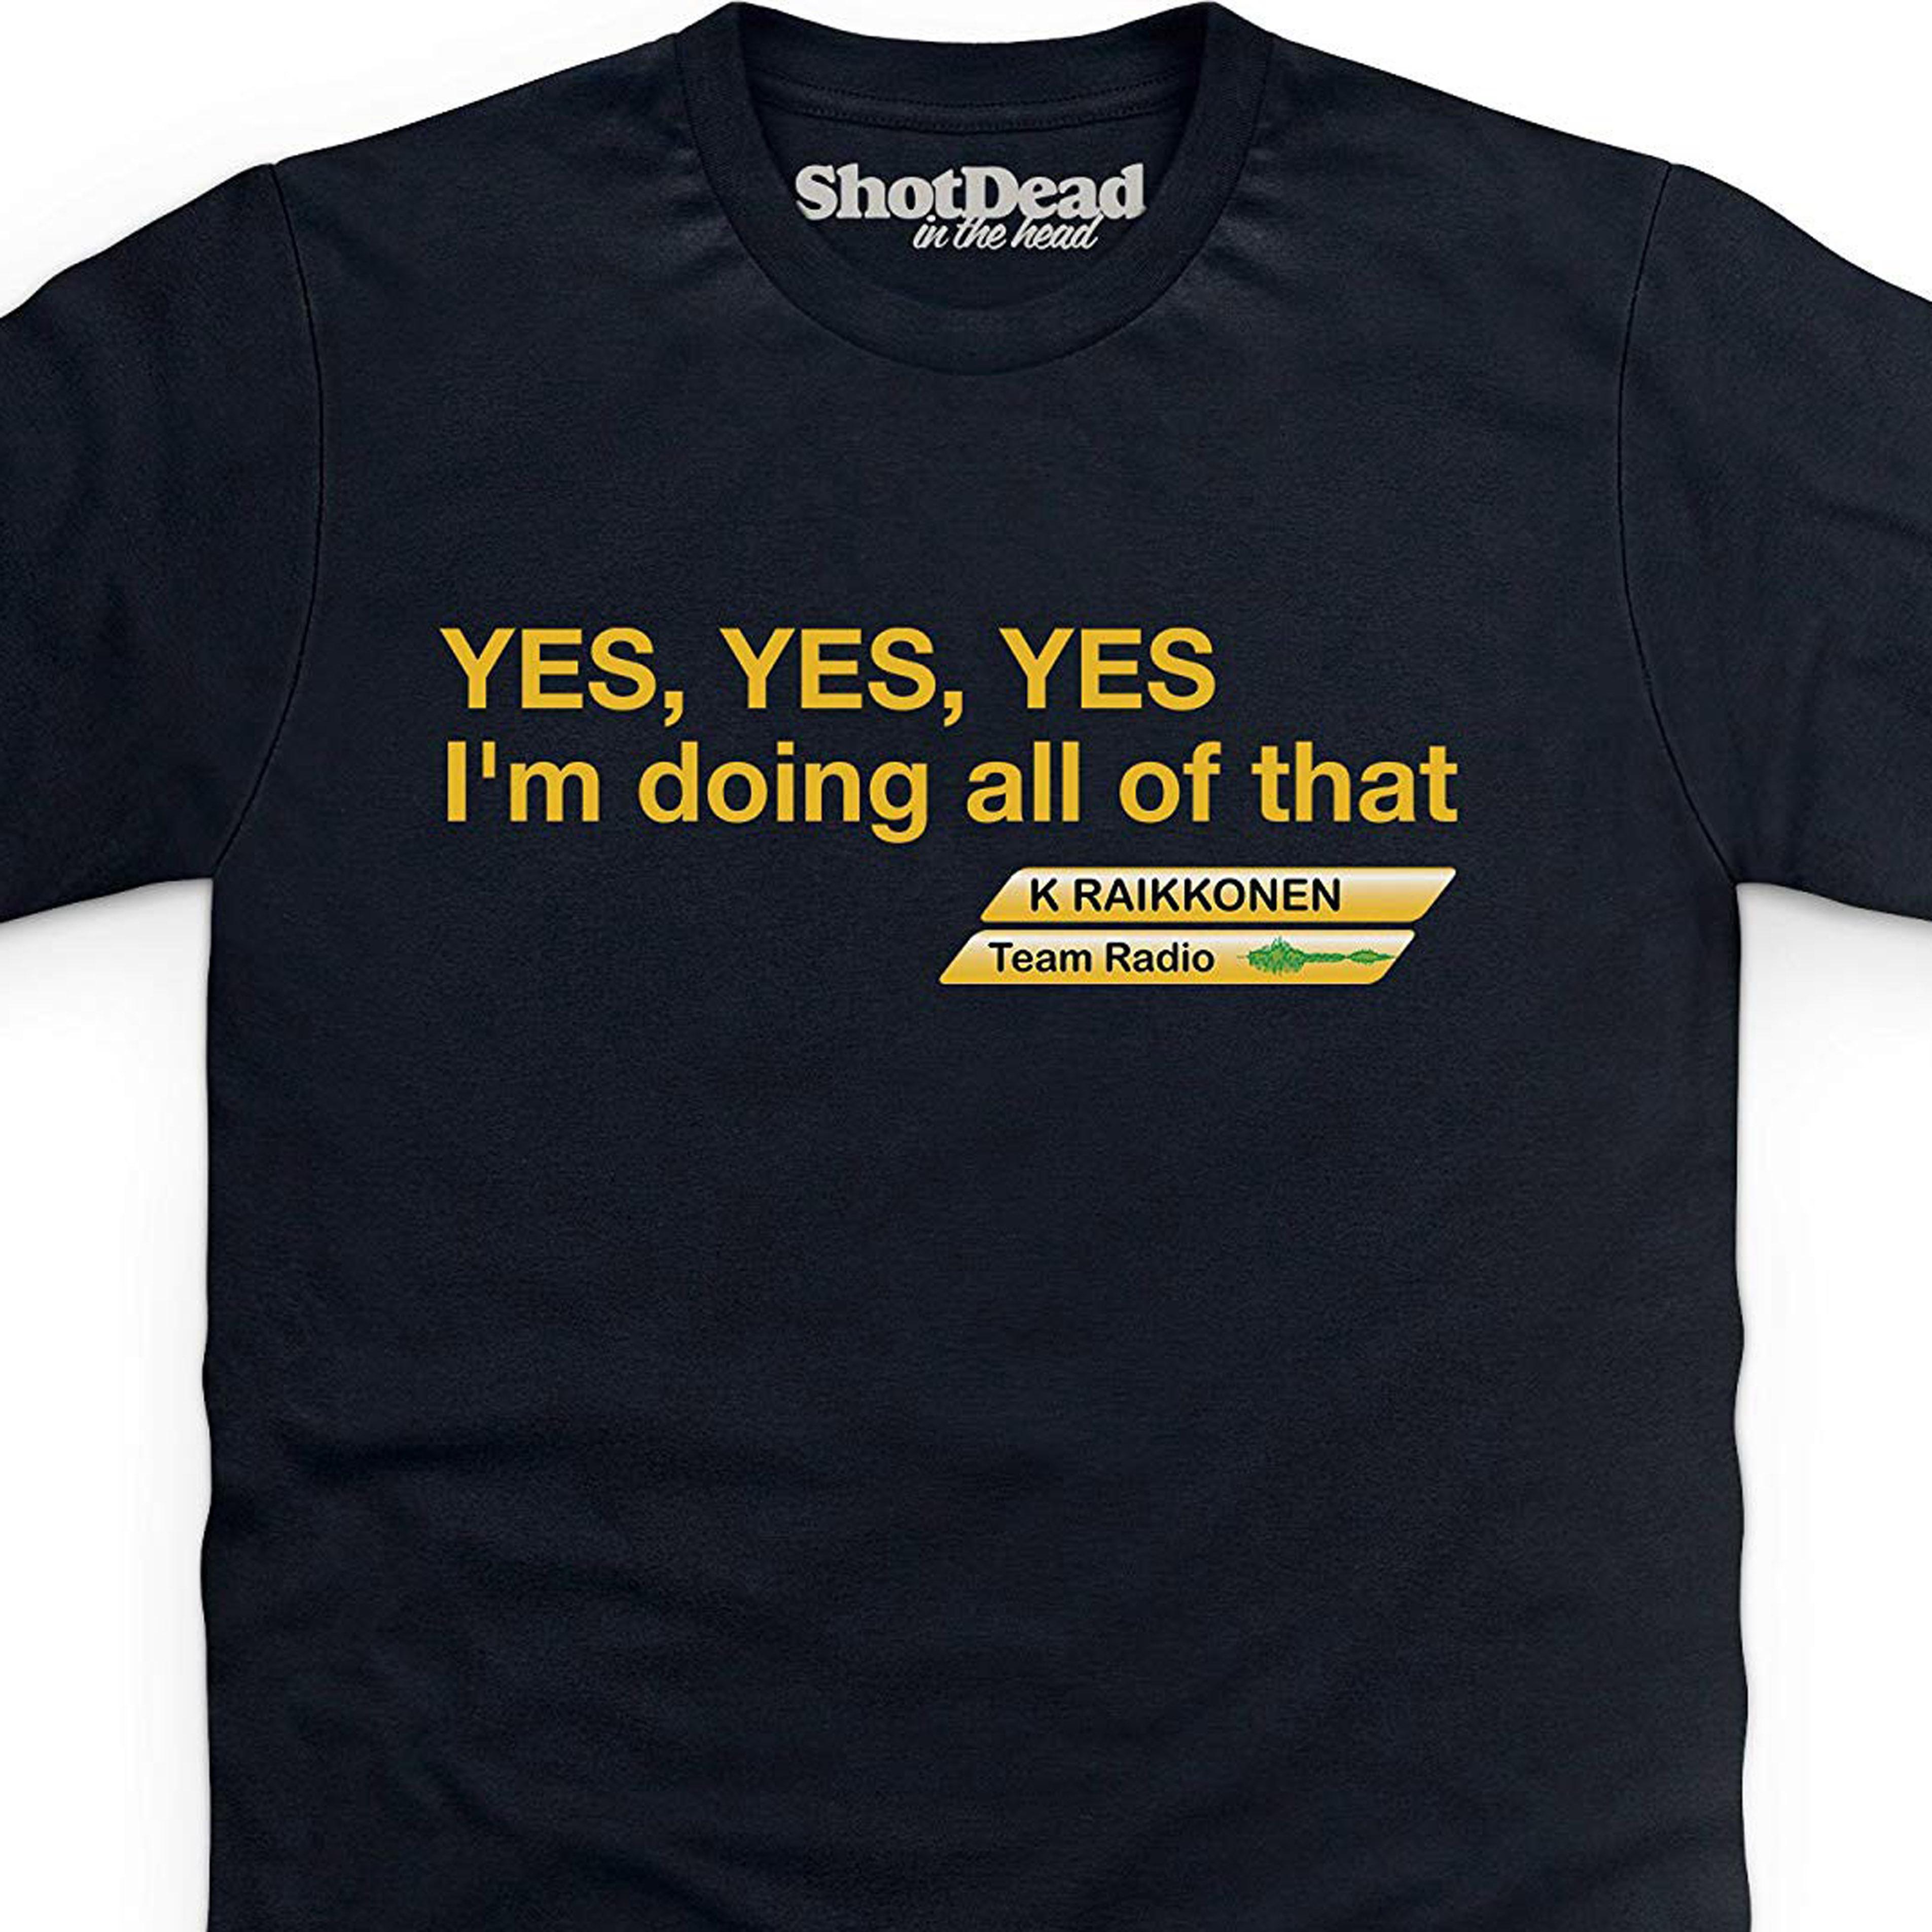 Shotdeadinthehead Kimi Raikkonen Sí Camiseta 100% algodón estampado hombres verano O cuello